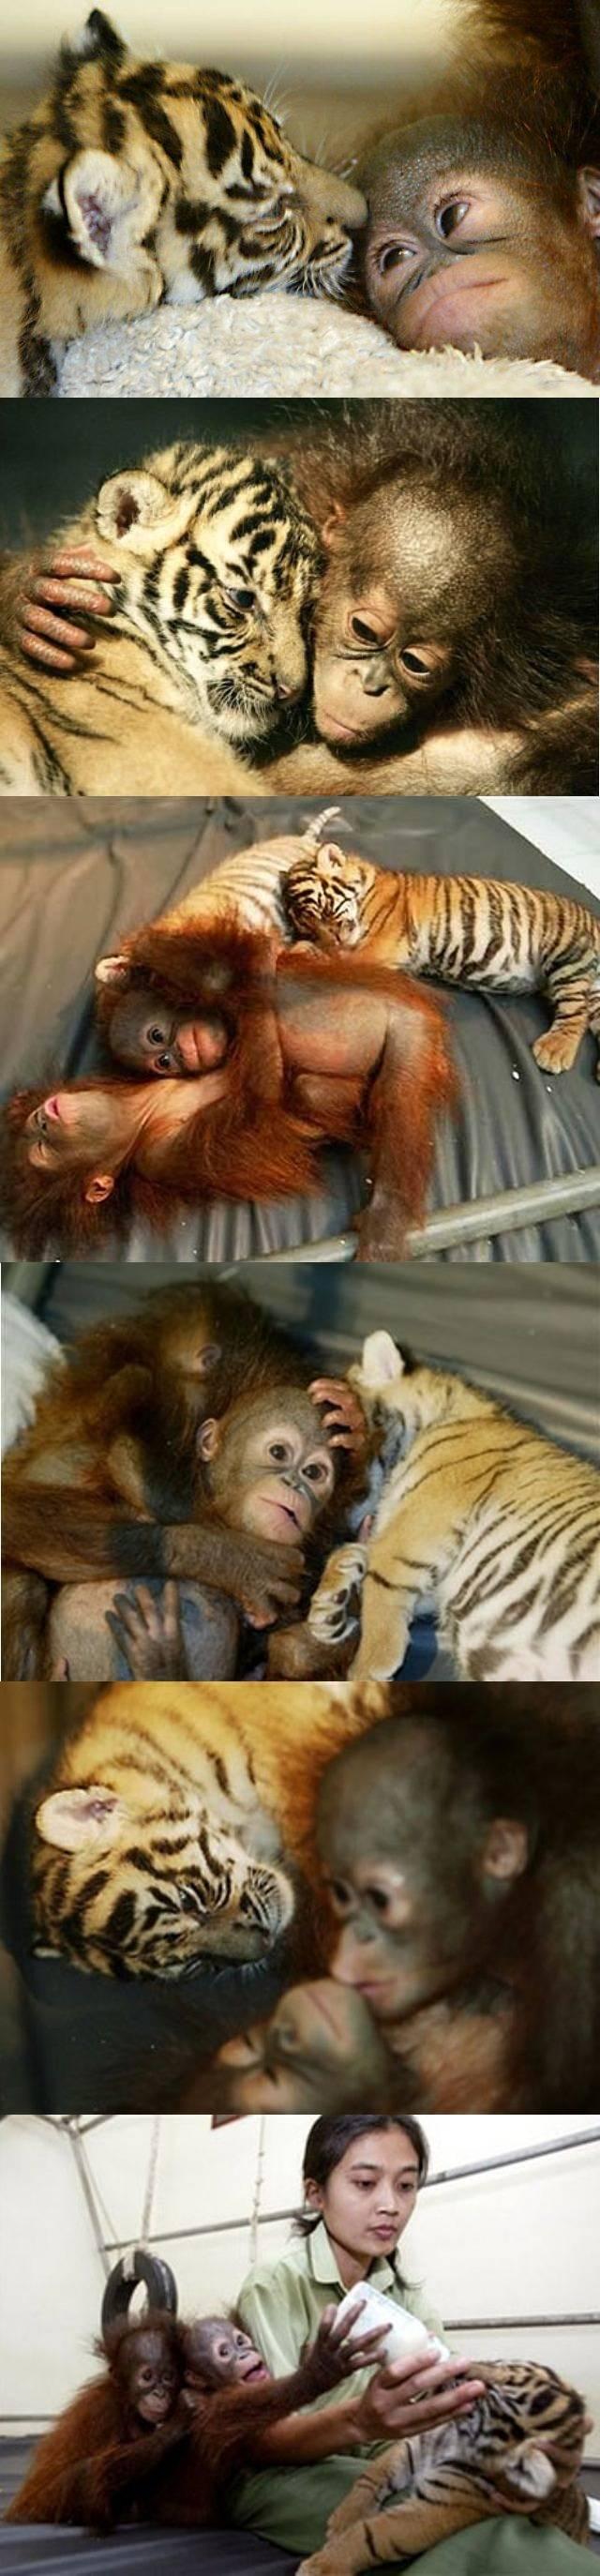 Orangutan Helps Hand Raise Tiger Cubs